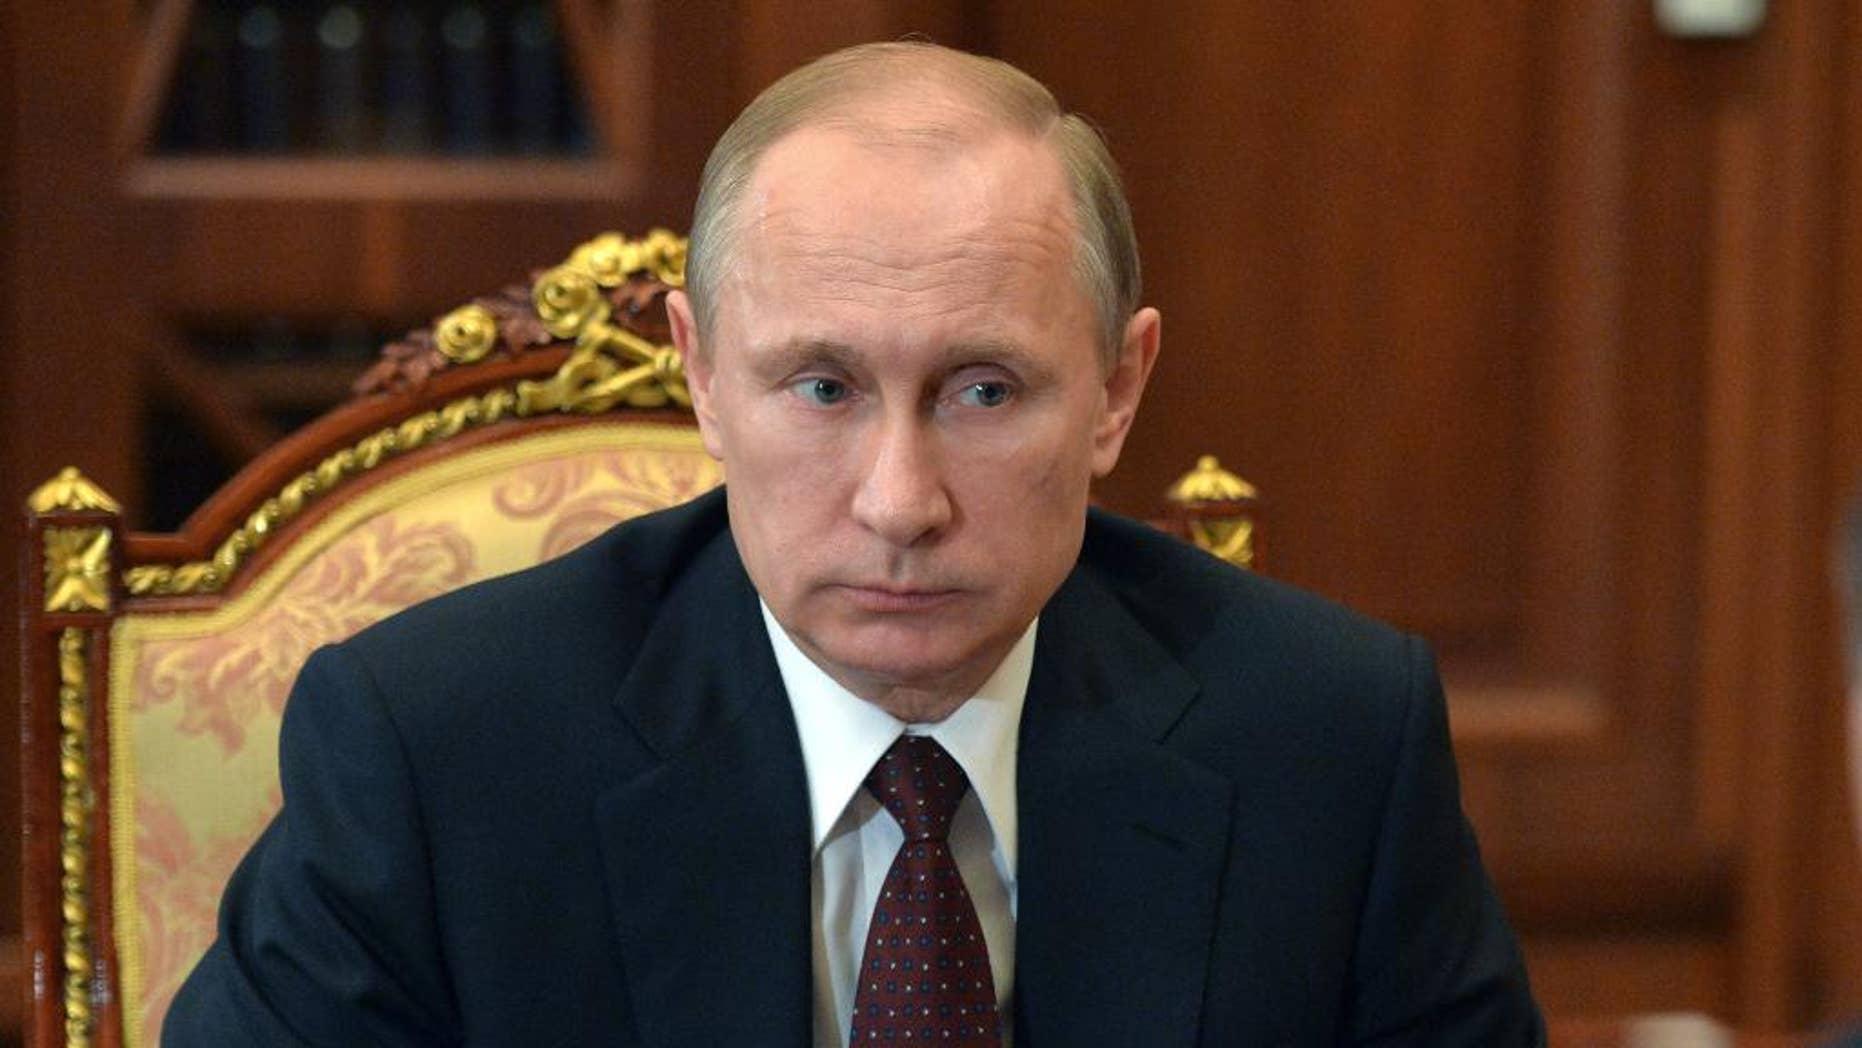 Russian President Vladimir Putin listens during a meeting at the Kremlin, in Moscow, Russia, Tuesday, March 10, 2015.(AP Photo/RIA Novosti, Alexei Druzhinin, Presidential Press Service)